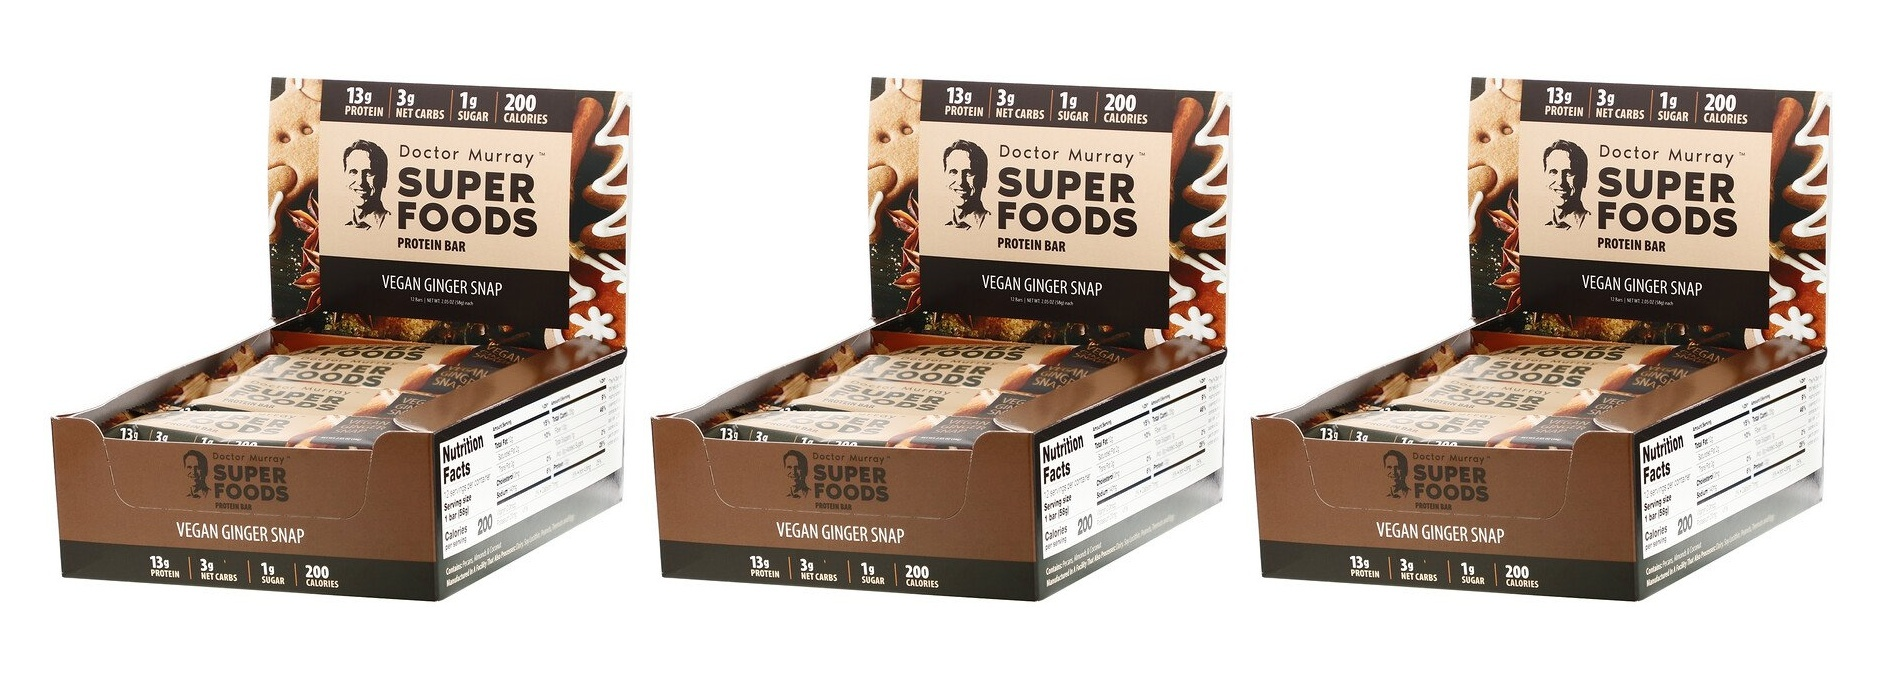 Dr. Murray's Superfoods Protein Bars, Vegan Protein Combo Pack, 12 Bars, 2.05 Oz (58 G) Each, 3-packs